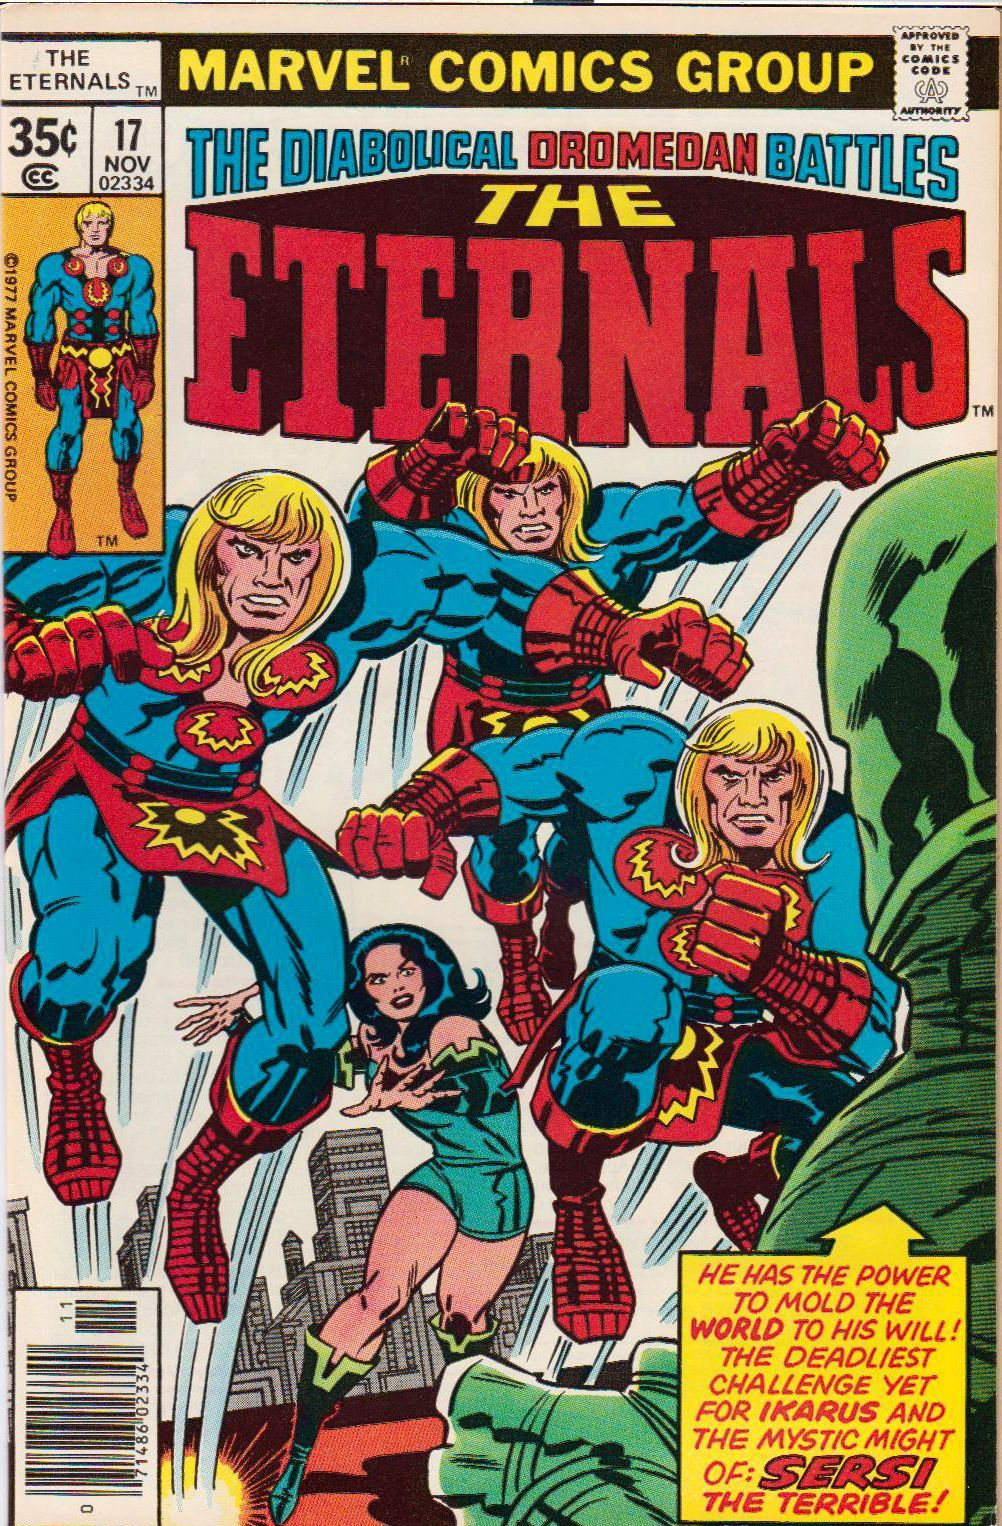 8eb9e1de414 Chloe Zhao to Direct Marvel Movie The Eternals